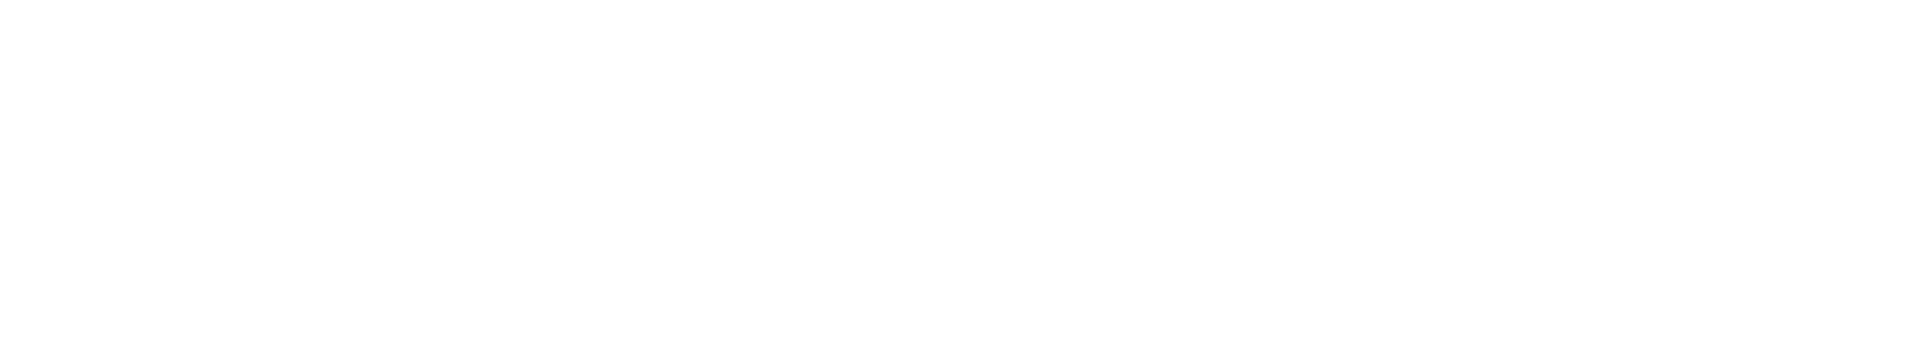 WauWau Zahlungsarten